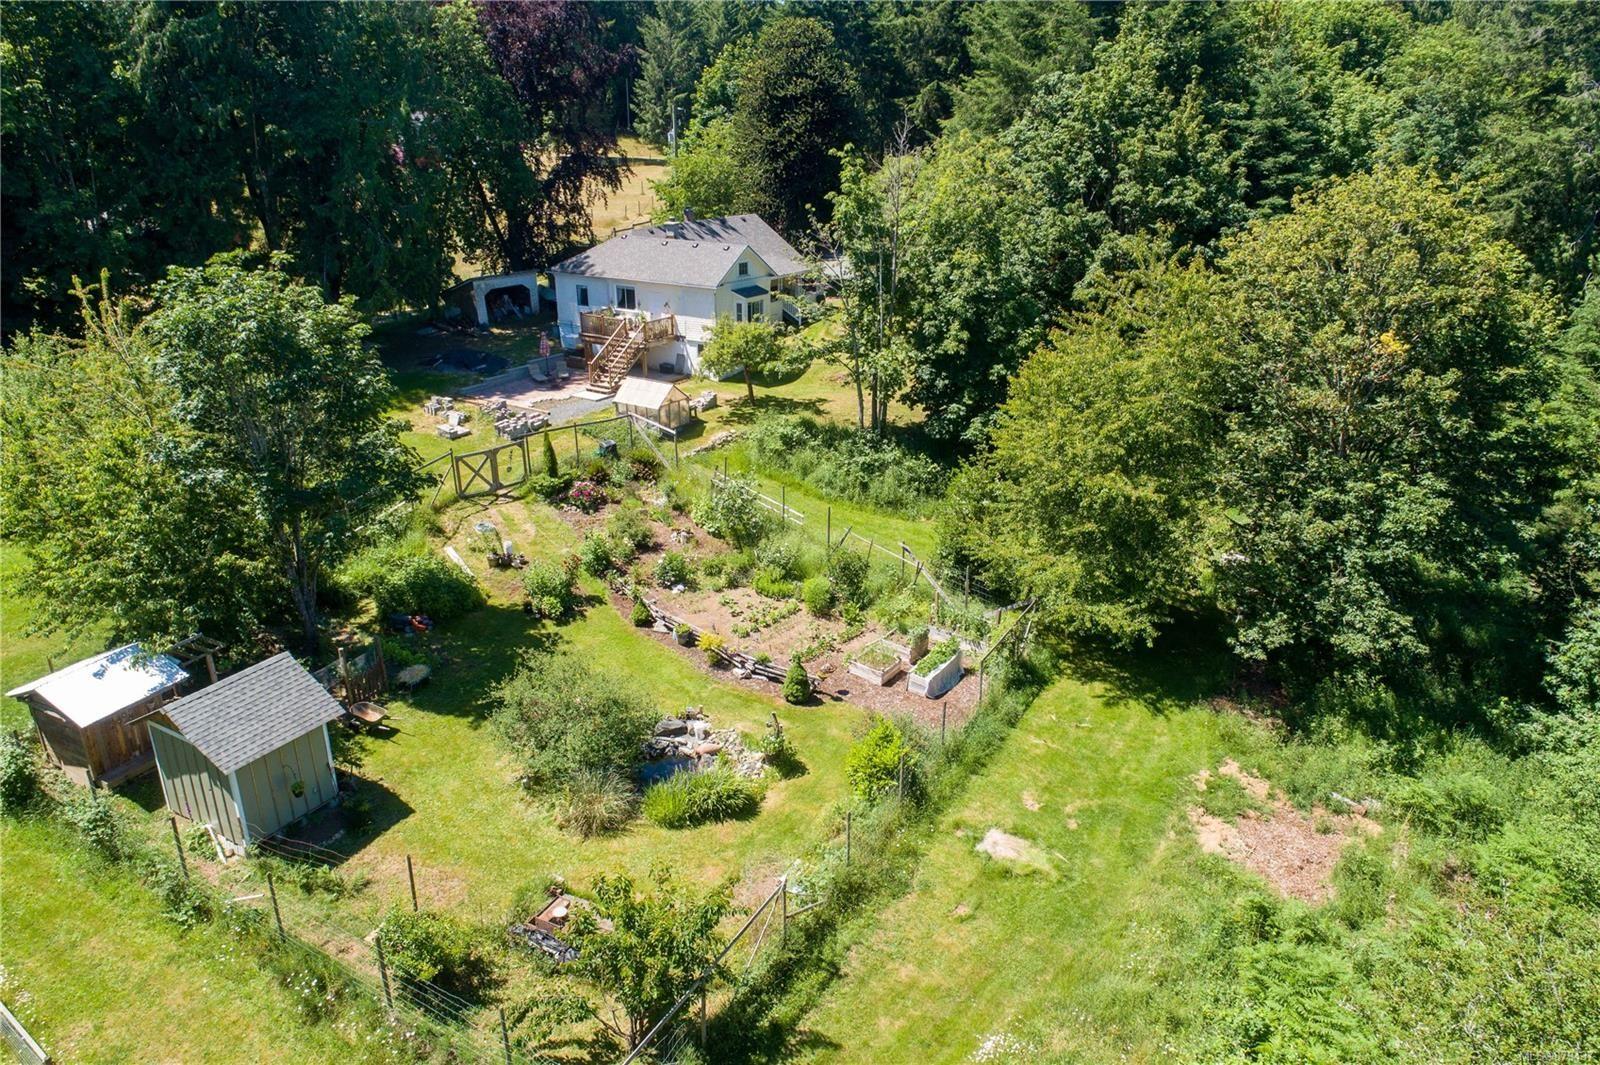 Main Photo: 2971 Shawnigan Lake Rd in Shawnigan Lake: ML Shawnigan House for sale (Malahat & Area)  : MLS®# 879437